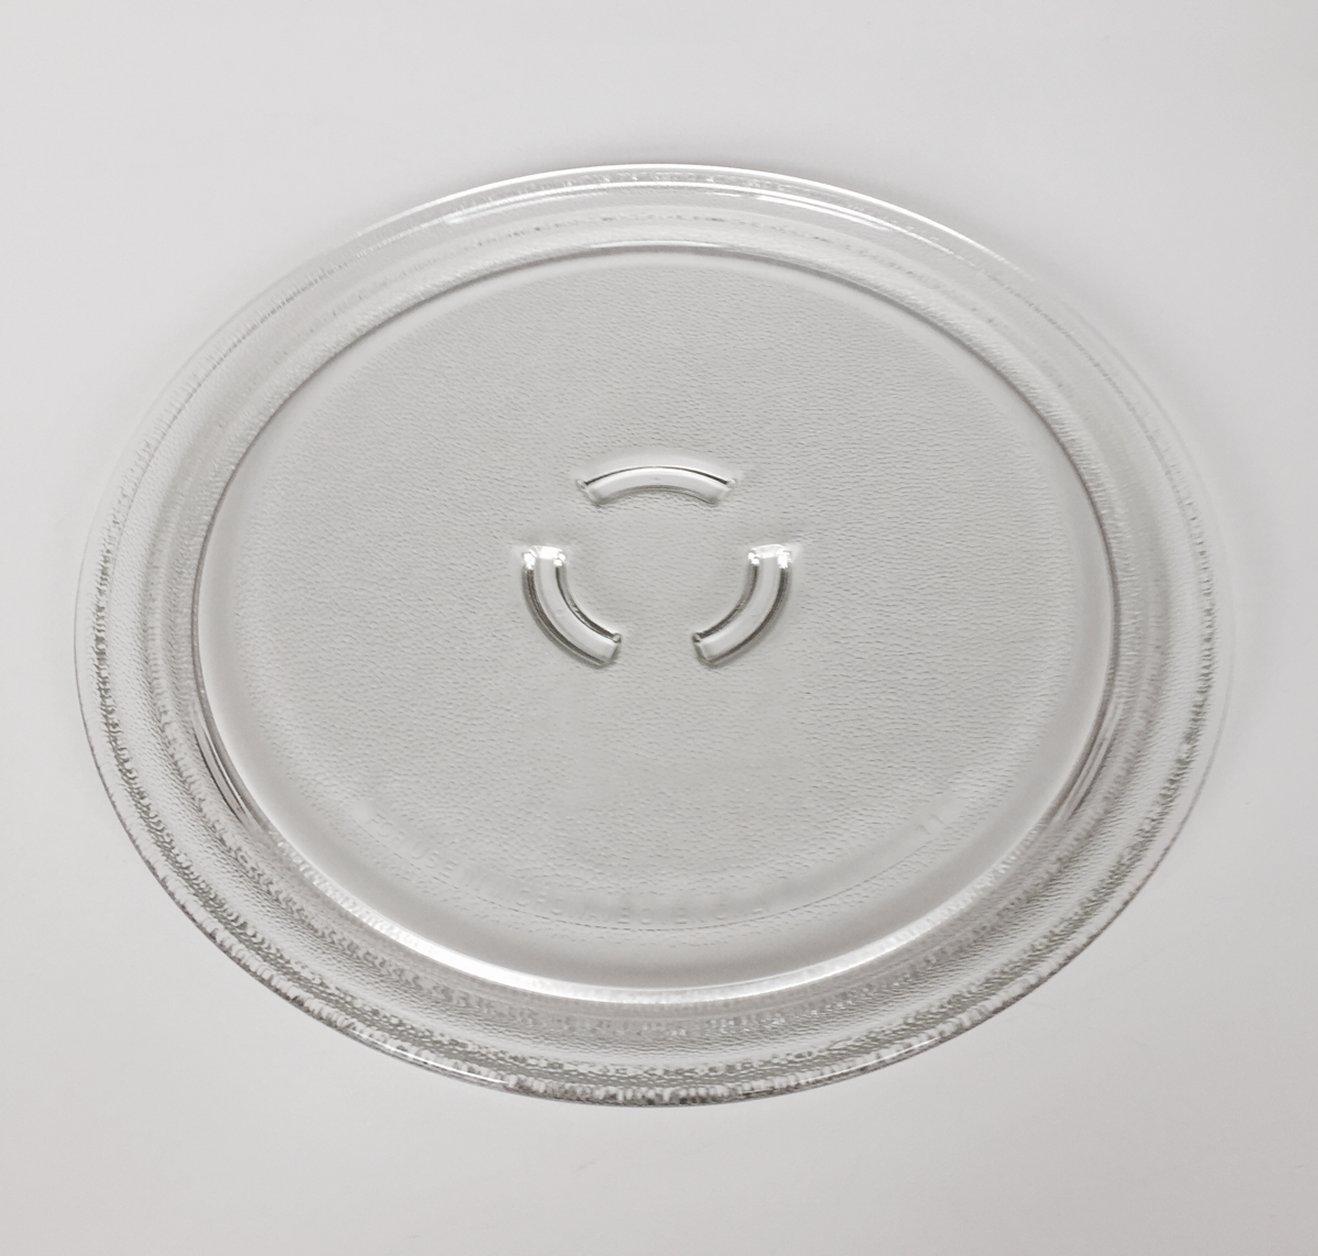 Drehteller Glasteller Mikrowelle Bauknecht Whirlpool Ikea